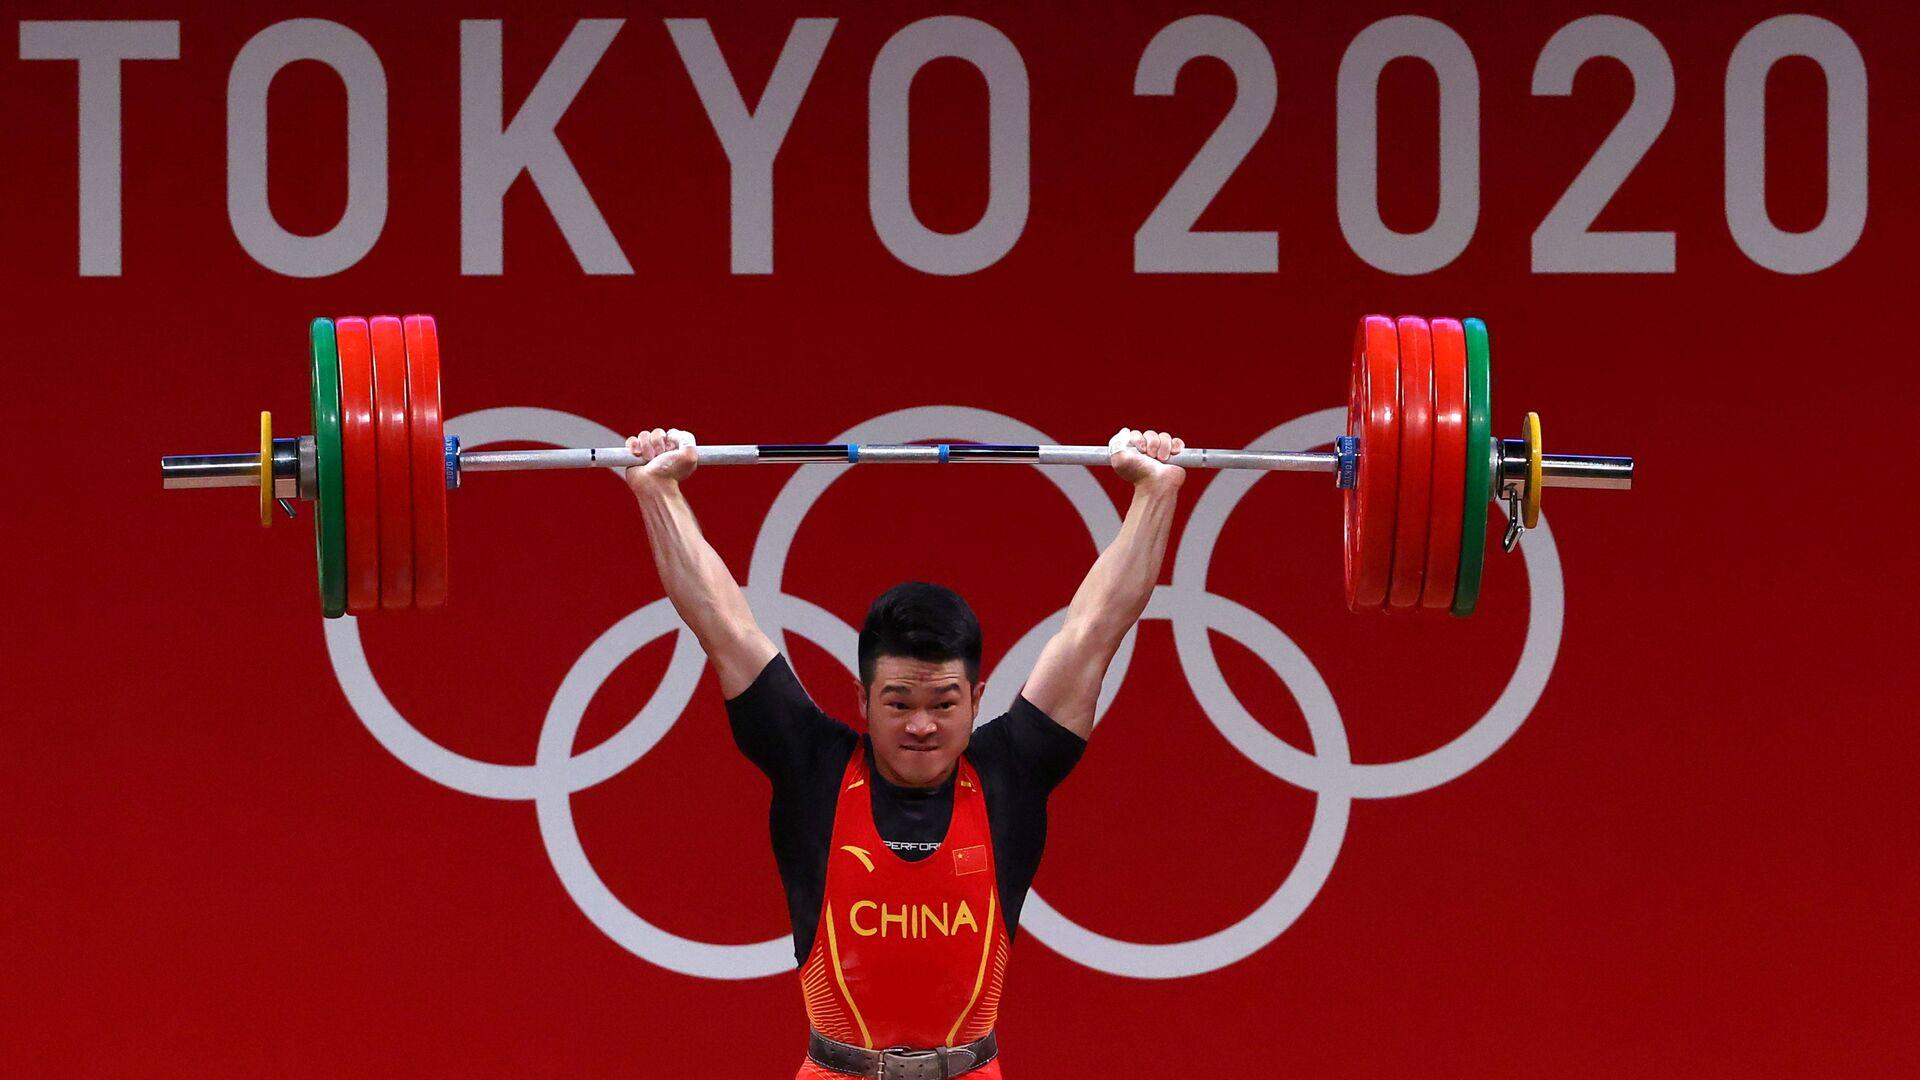 Tokyo 2020 Olympics - Weightlifting - Men's 73kg - Group A - Tokyo International Forum, Tokyo, Japan - July 28, 2021. Shi Zhiyong of China in action - Sputnik International, 1920, 07.09.2021